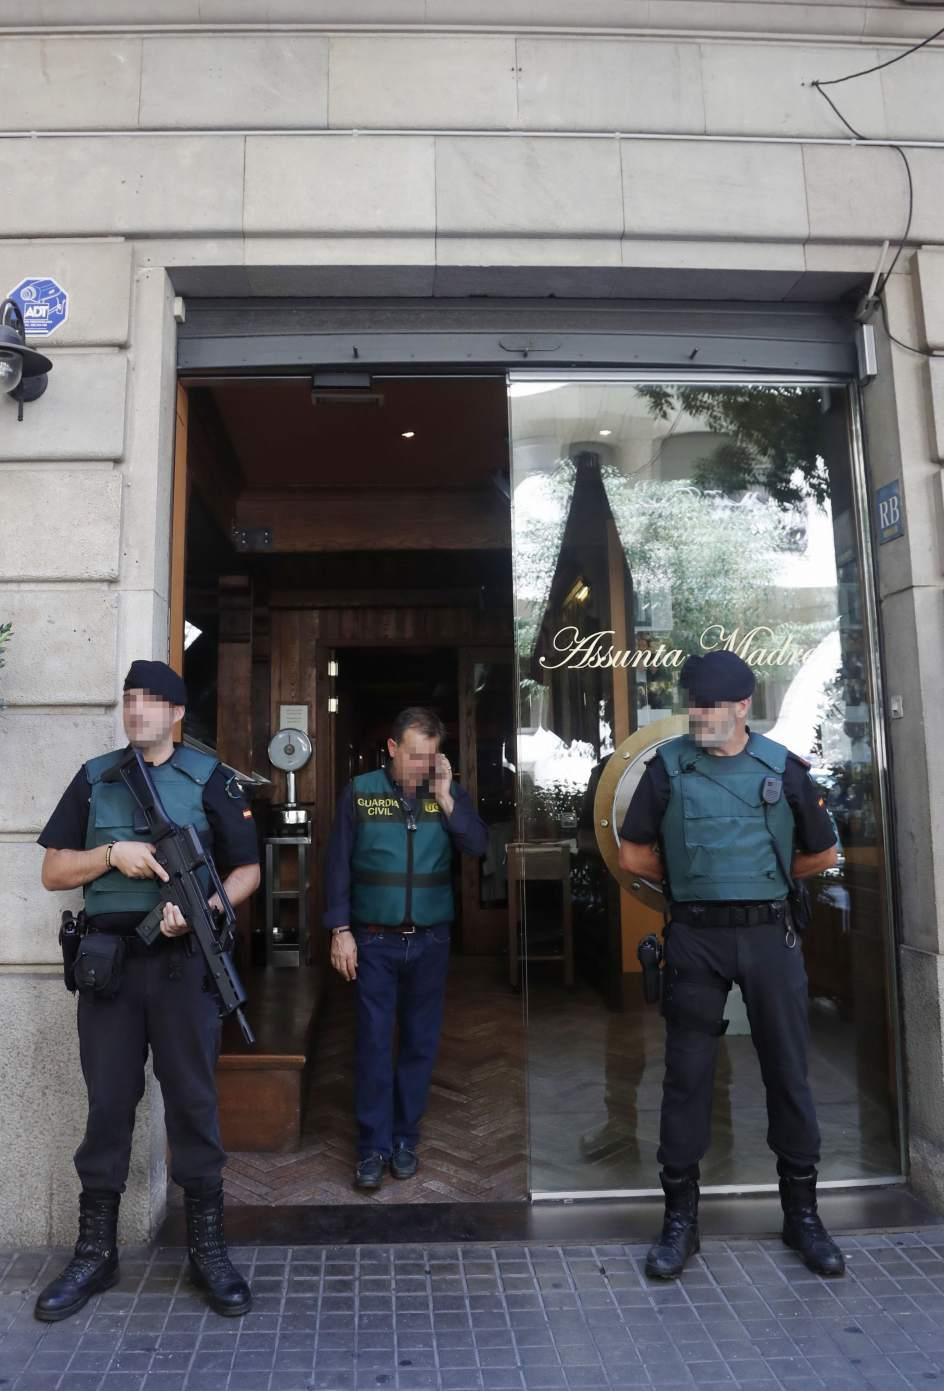 Registran el restaurante assunta madre de barcelona en una - Assunta madre barcelona ...